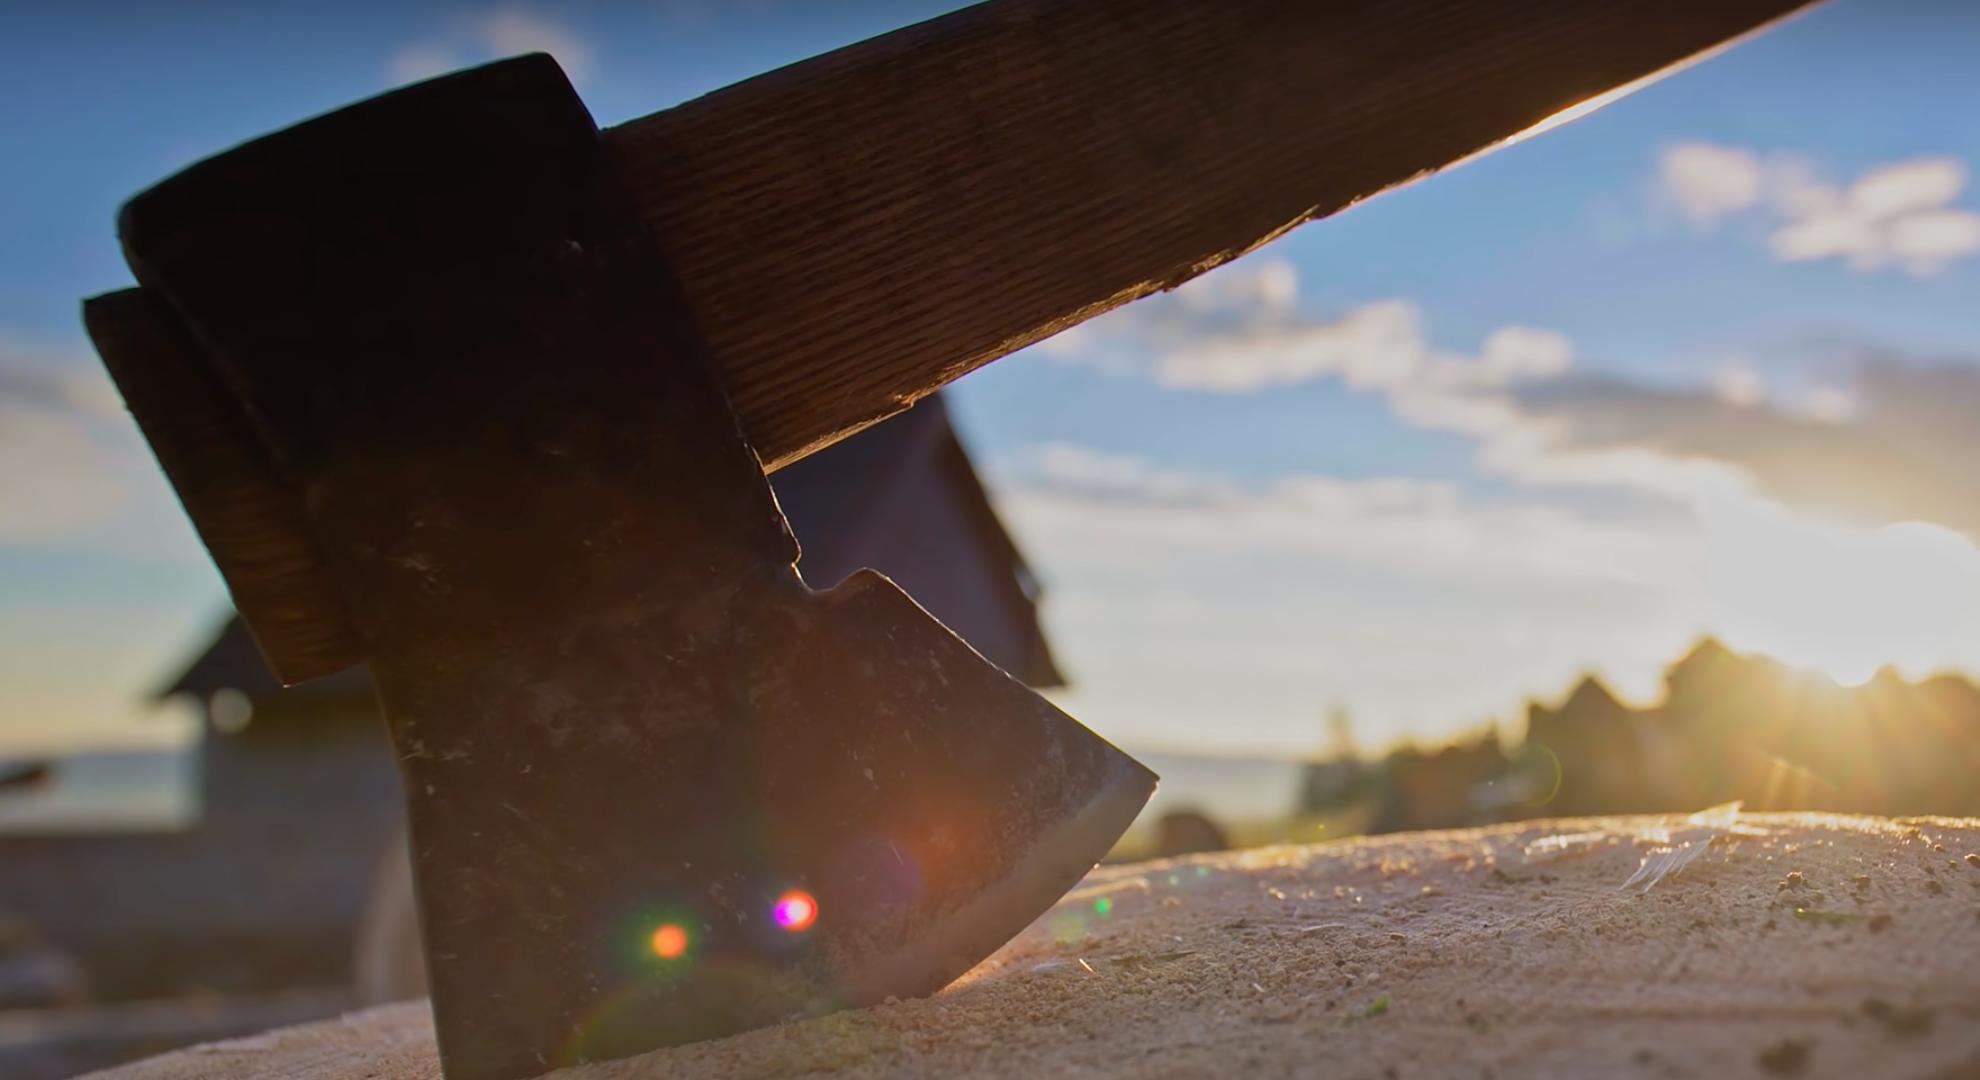 Ostatni Górale – film, który zaskakuje